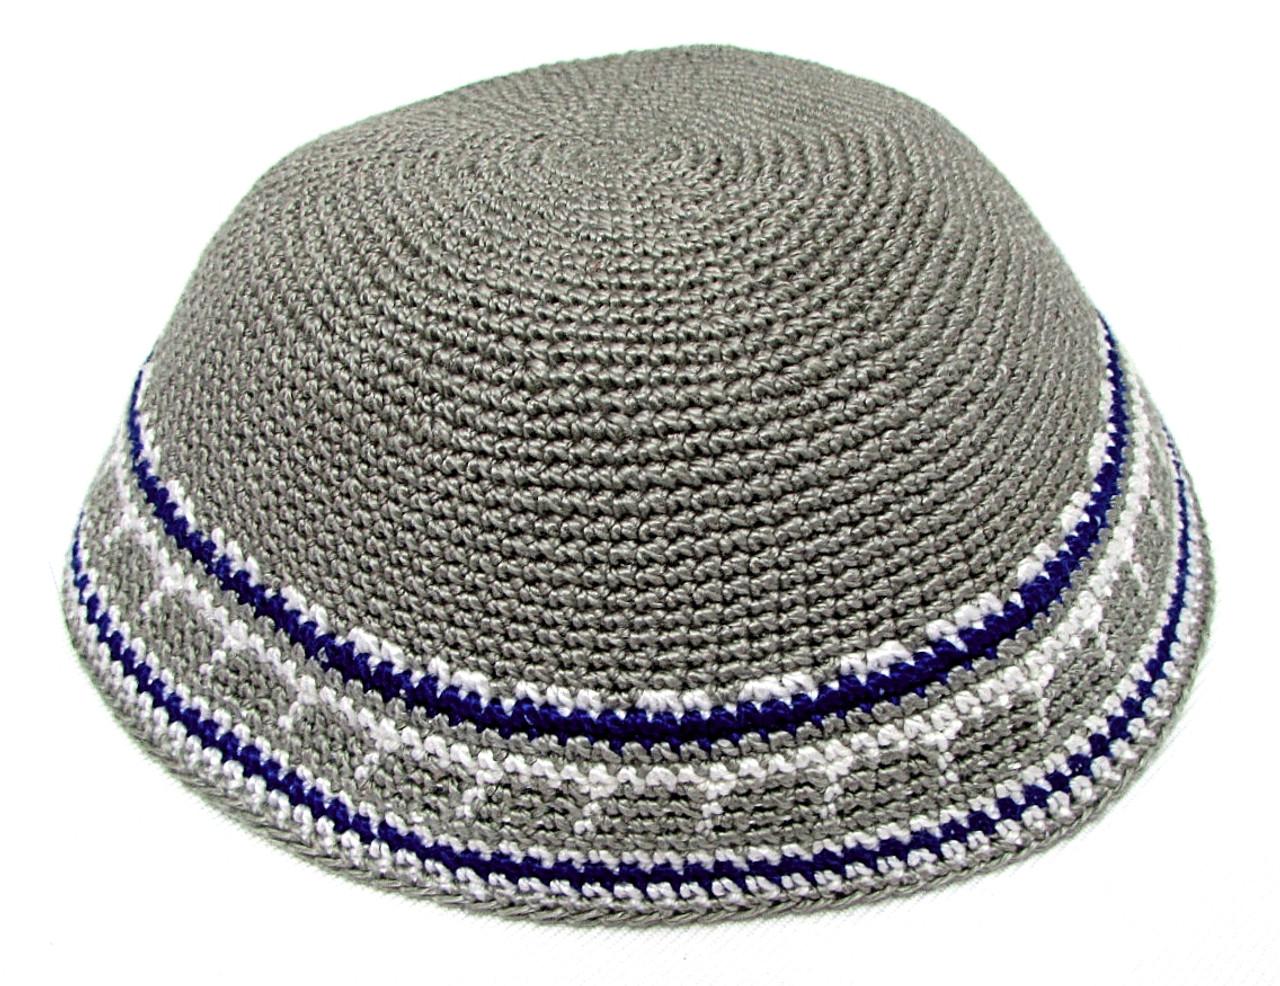 Light Gray DMC Knitted Kippah with Blue & White Trim